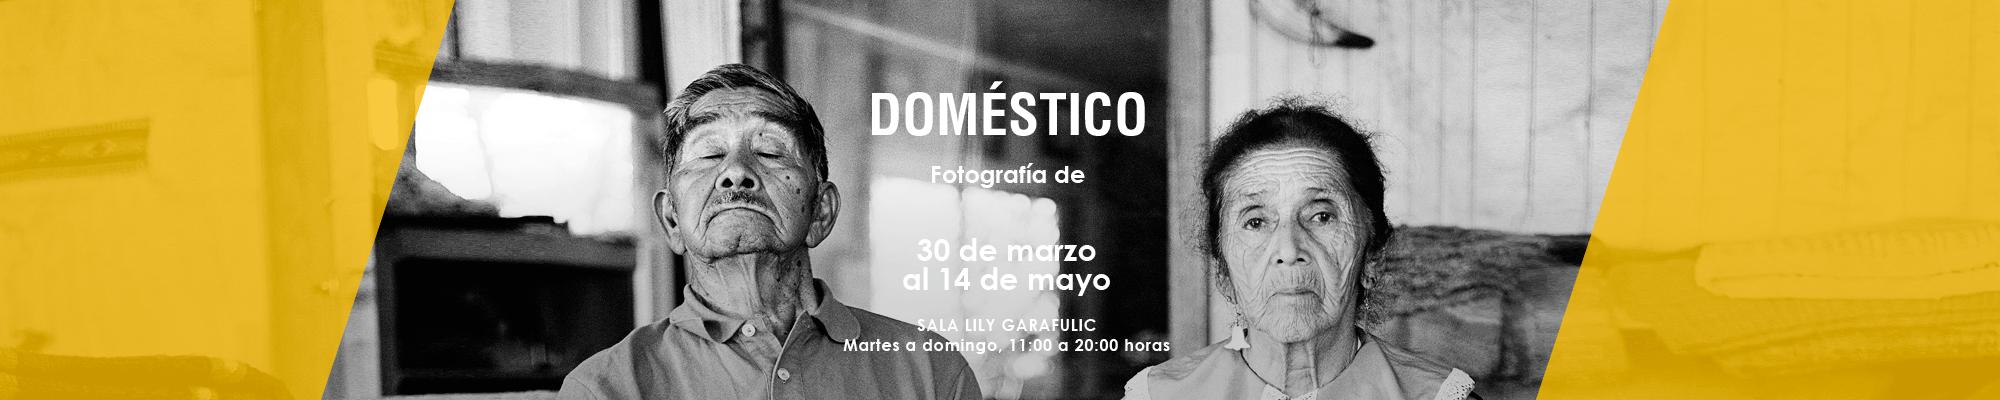 Doméstico. Fotografía de Guillermo González